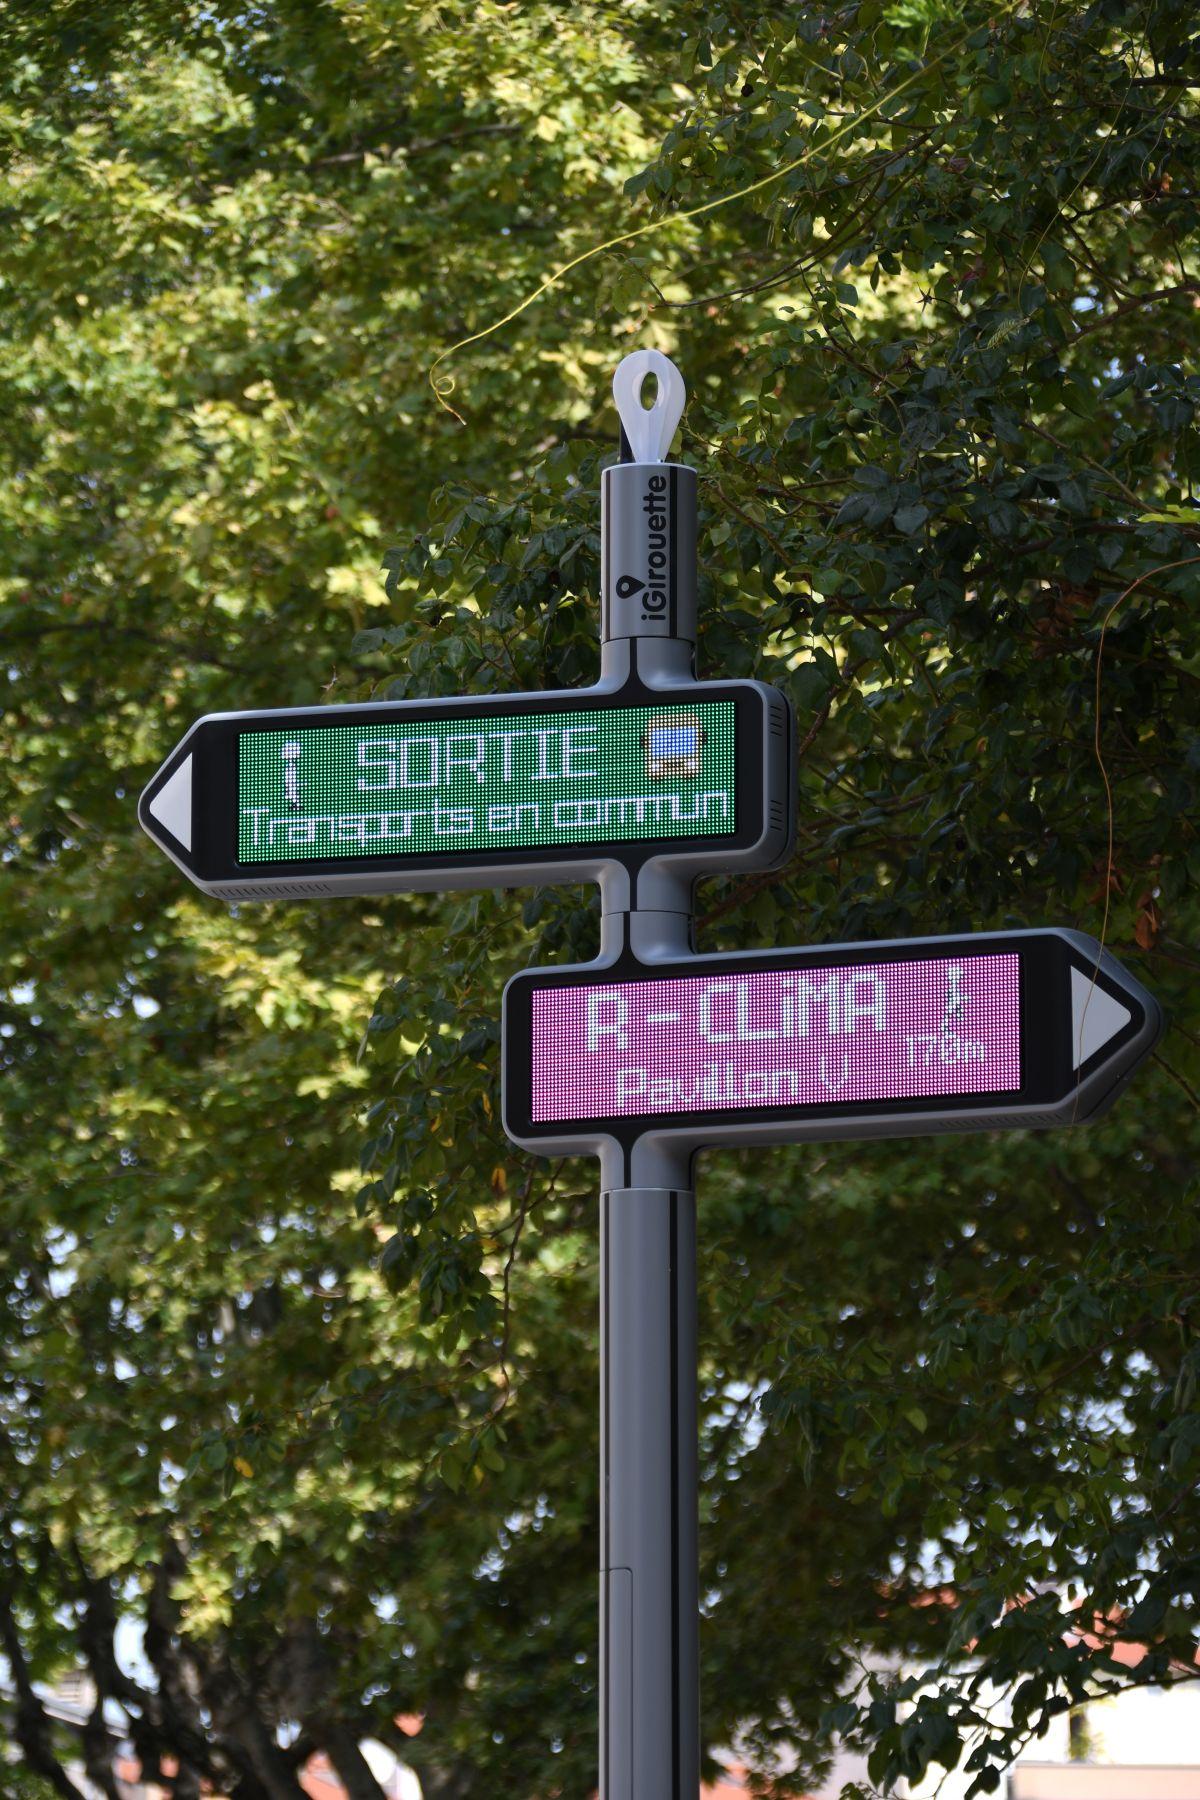 The Hospices Civils de Lyon chose <strong>iGirouette®</strong>!